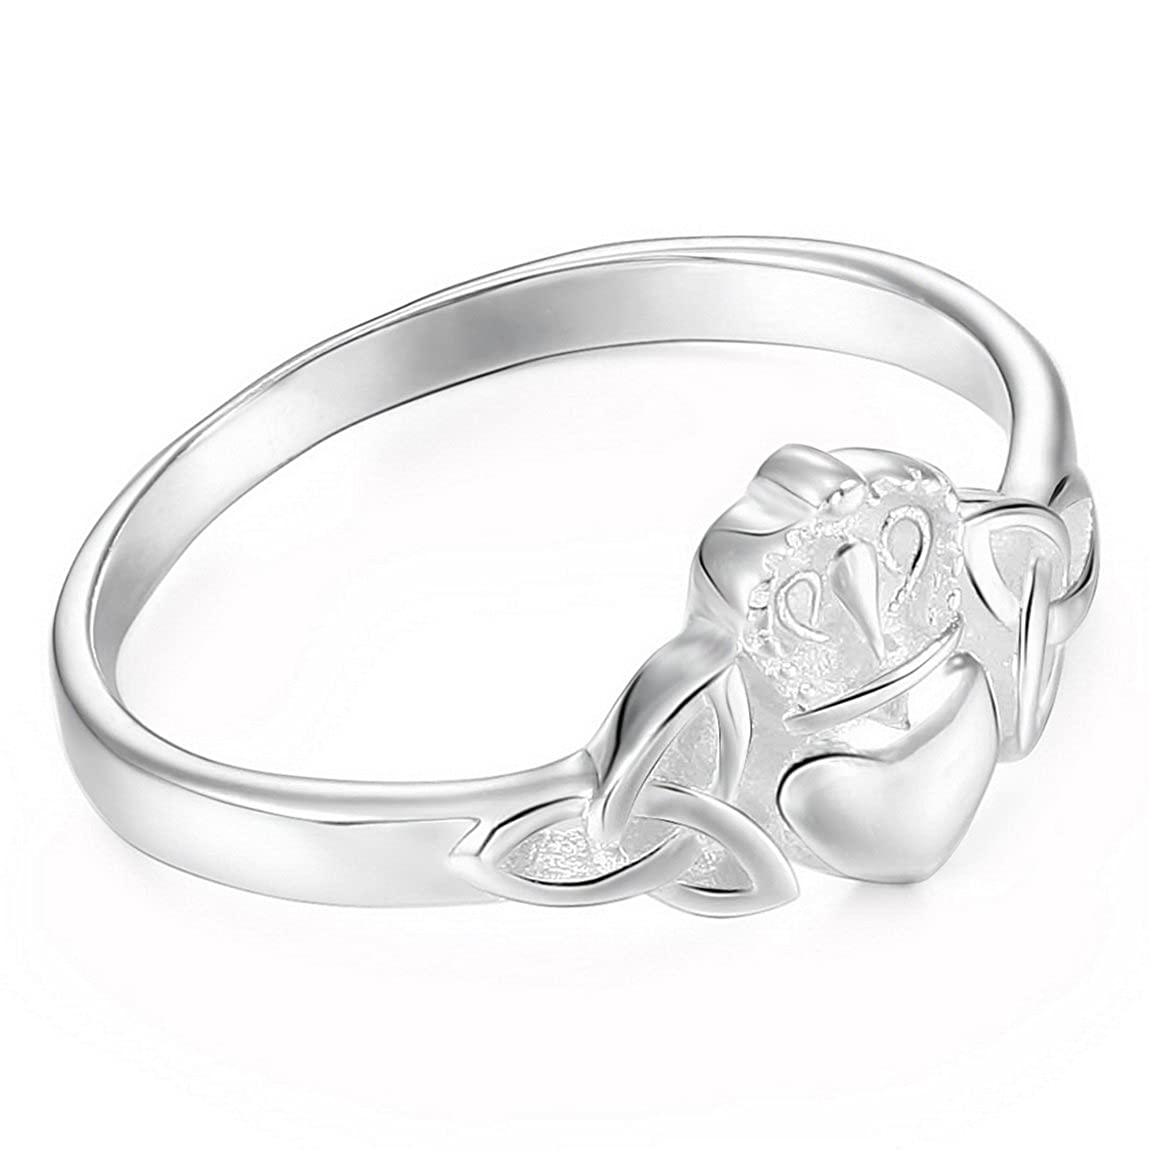 INBLUE Womens 925 Sterling Silver Ring Heart Irish Claddagh Friendship Love Crown Wedding